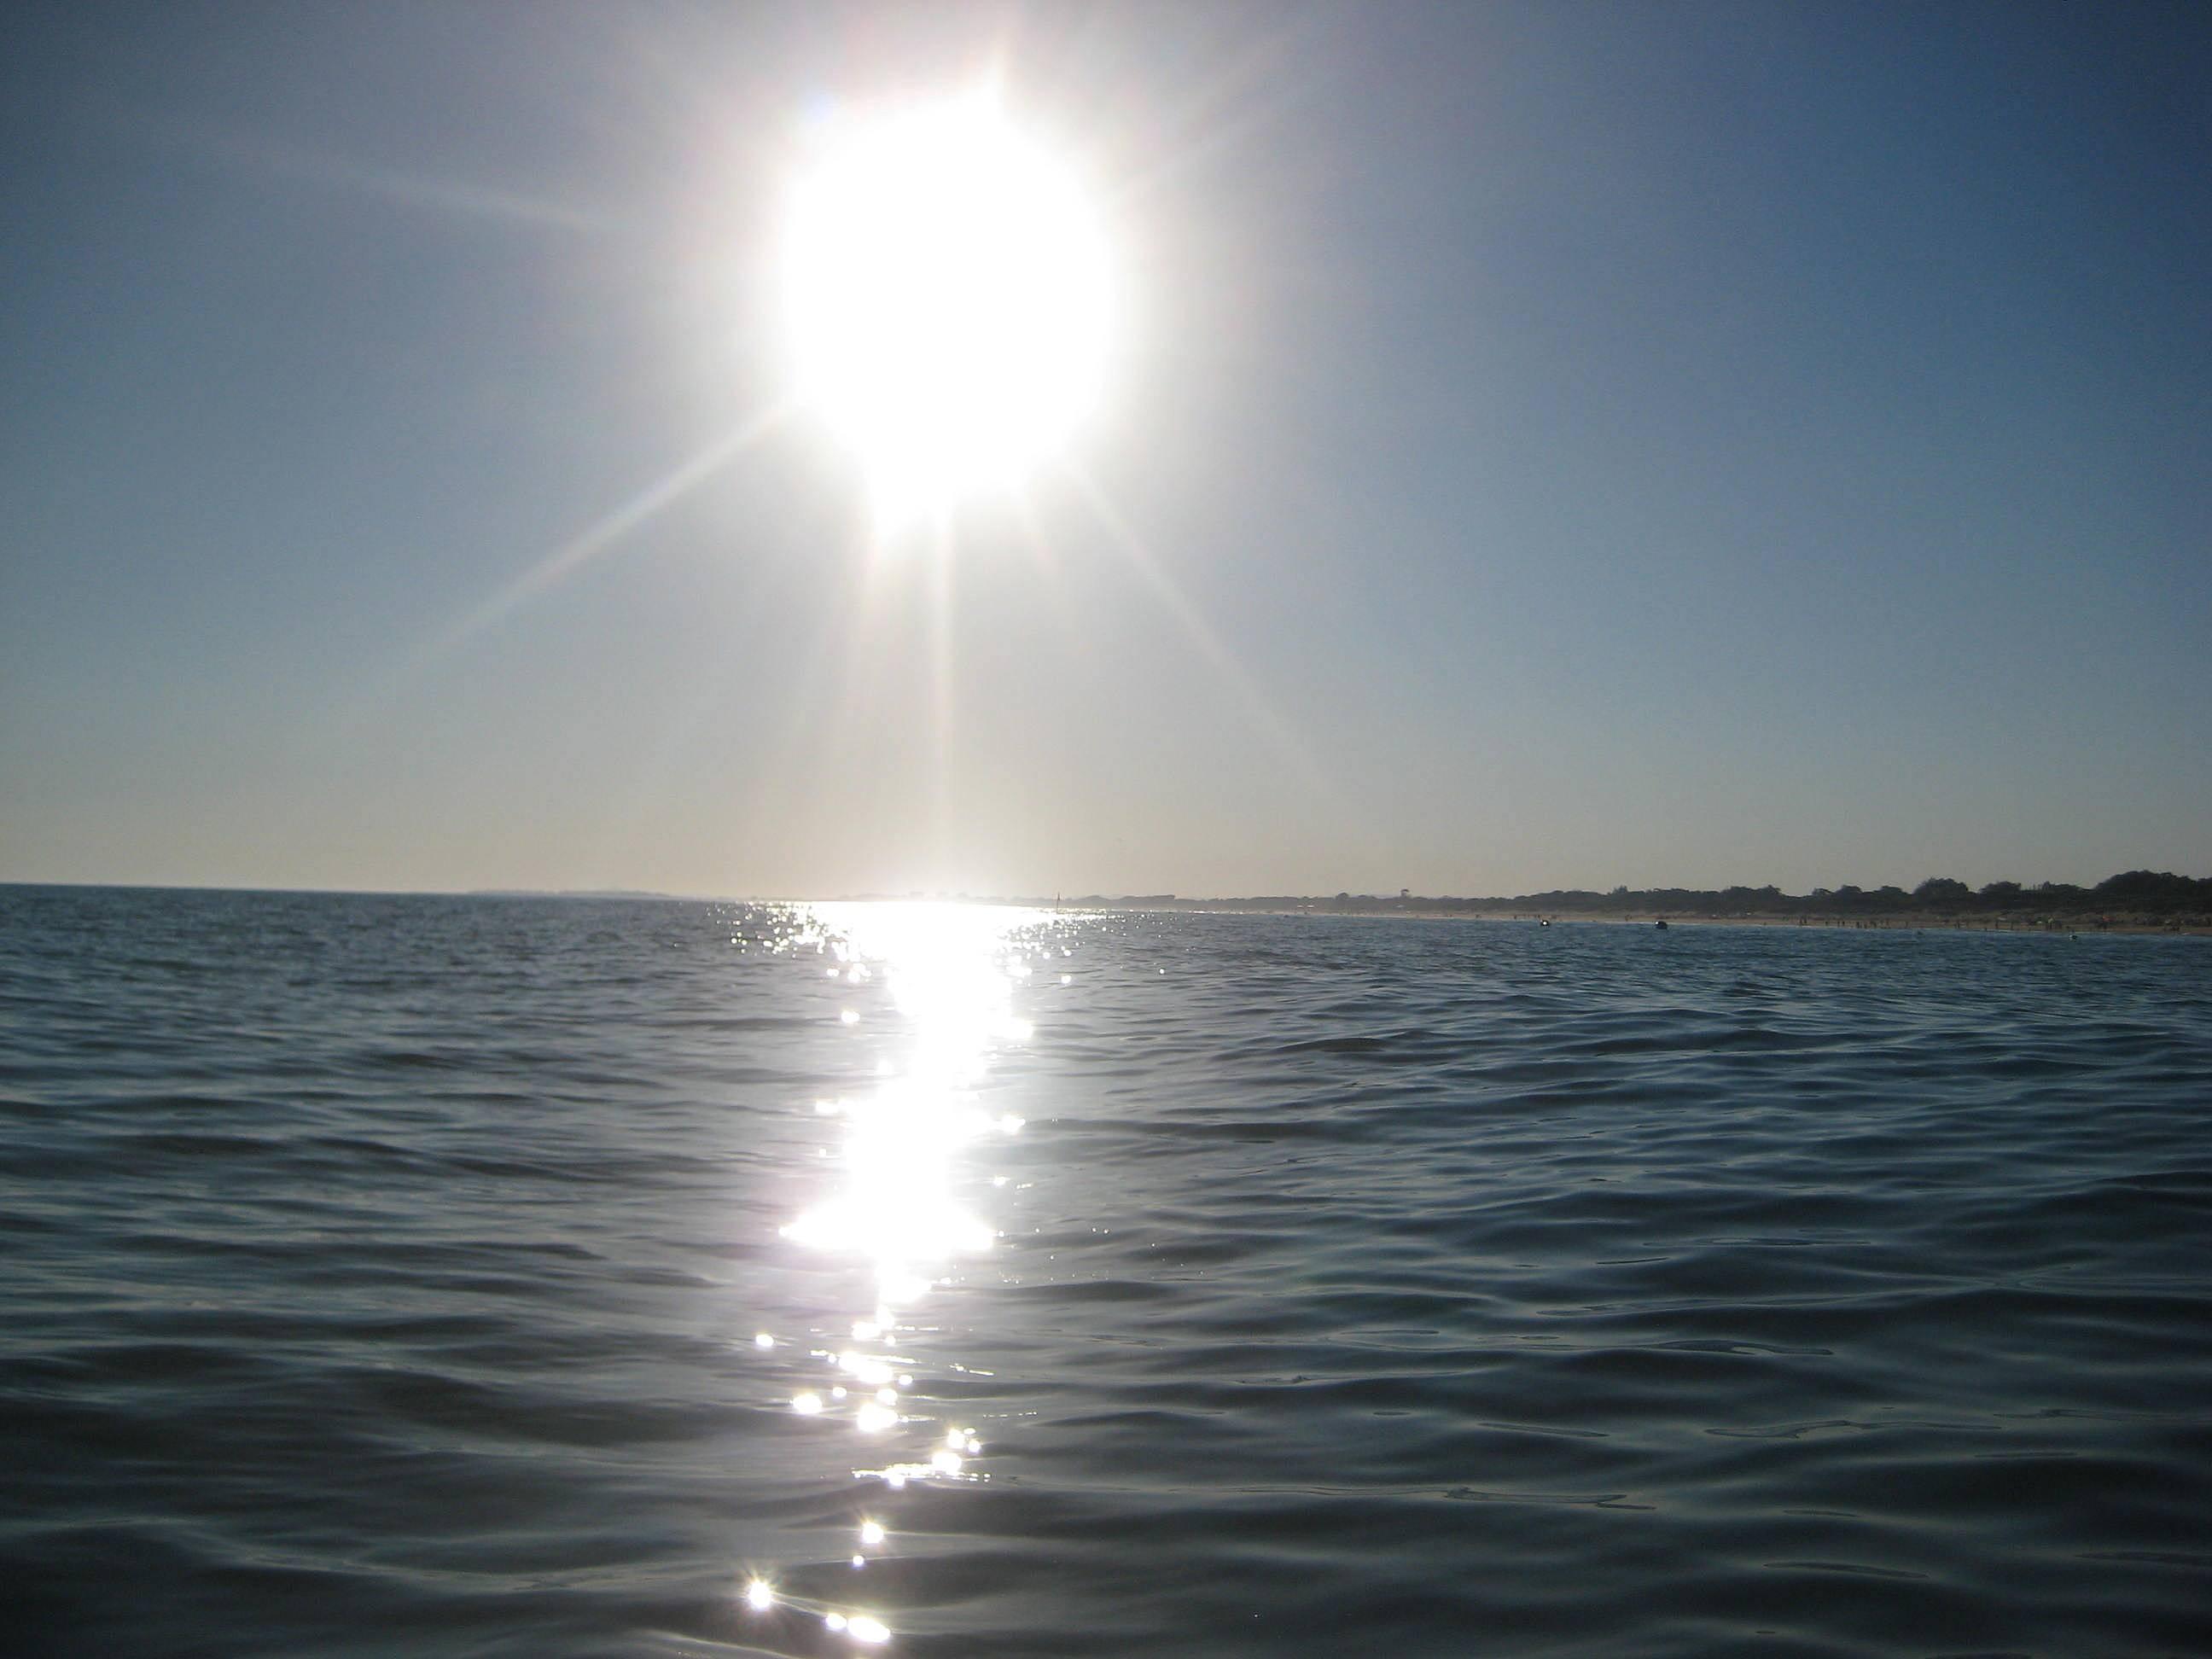 Casa para 6 pessoas a 200 m da praia islantilla i - Rentalia islantilla ...